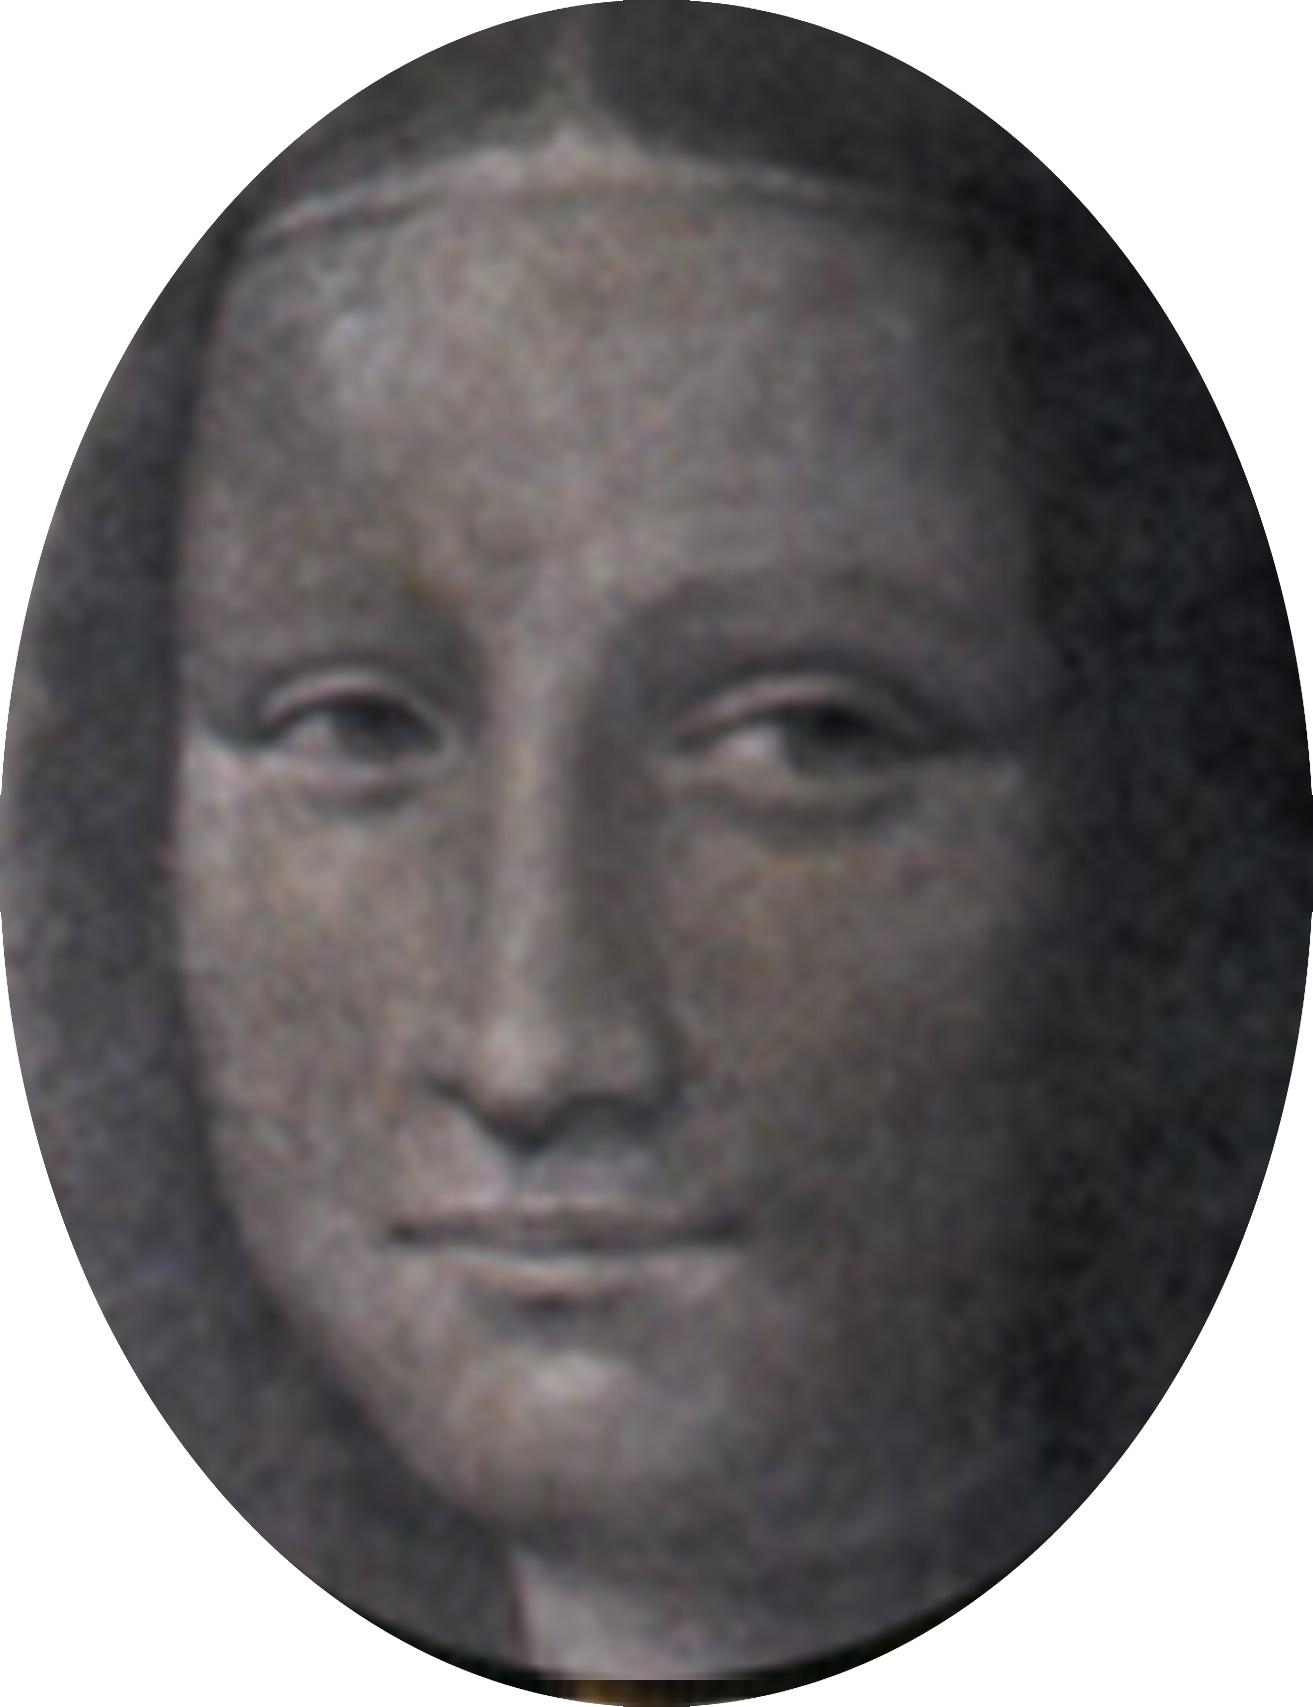 mona-drawing-face.jpg